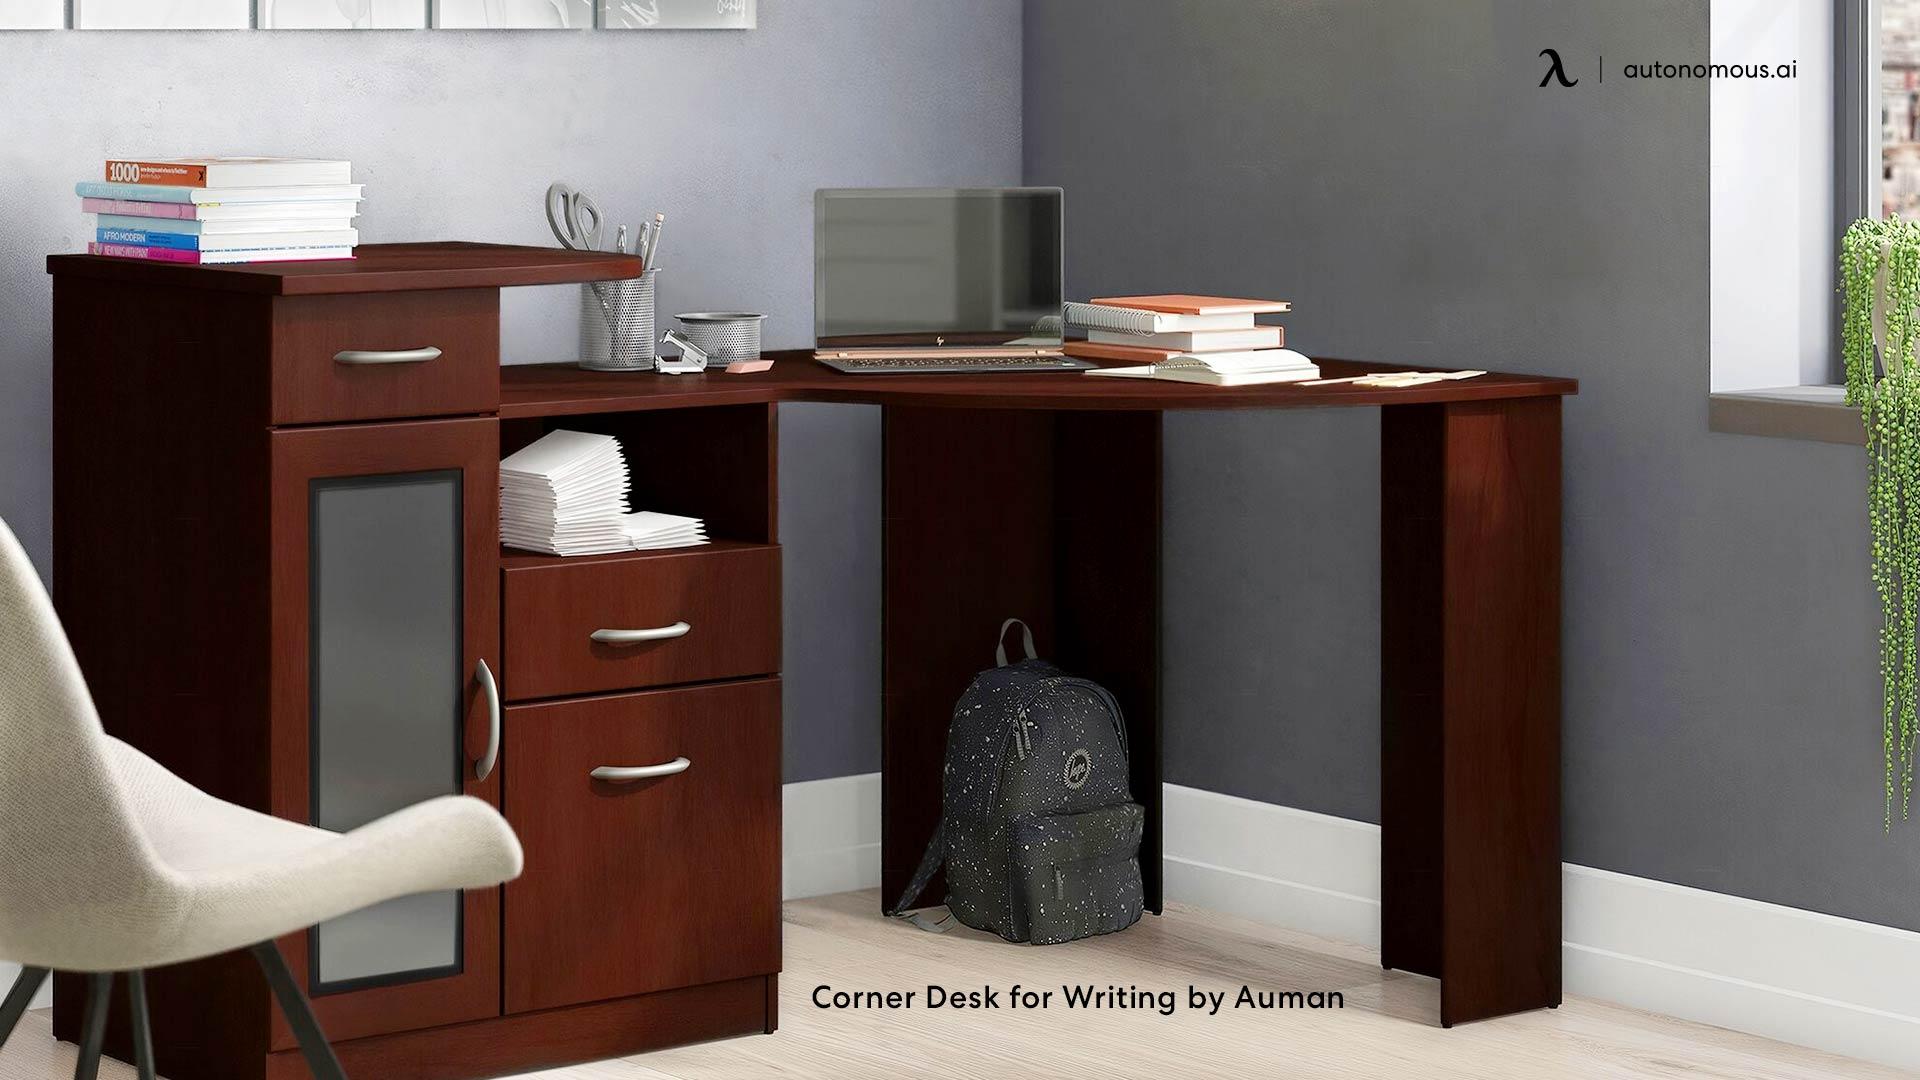 Corner Desk for Writing by Auman